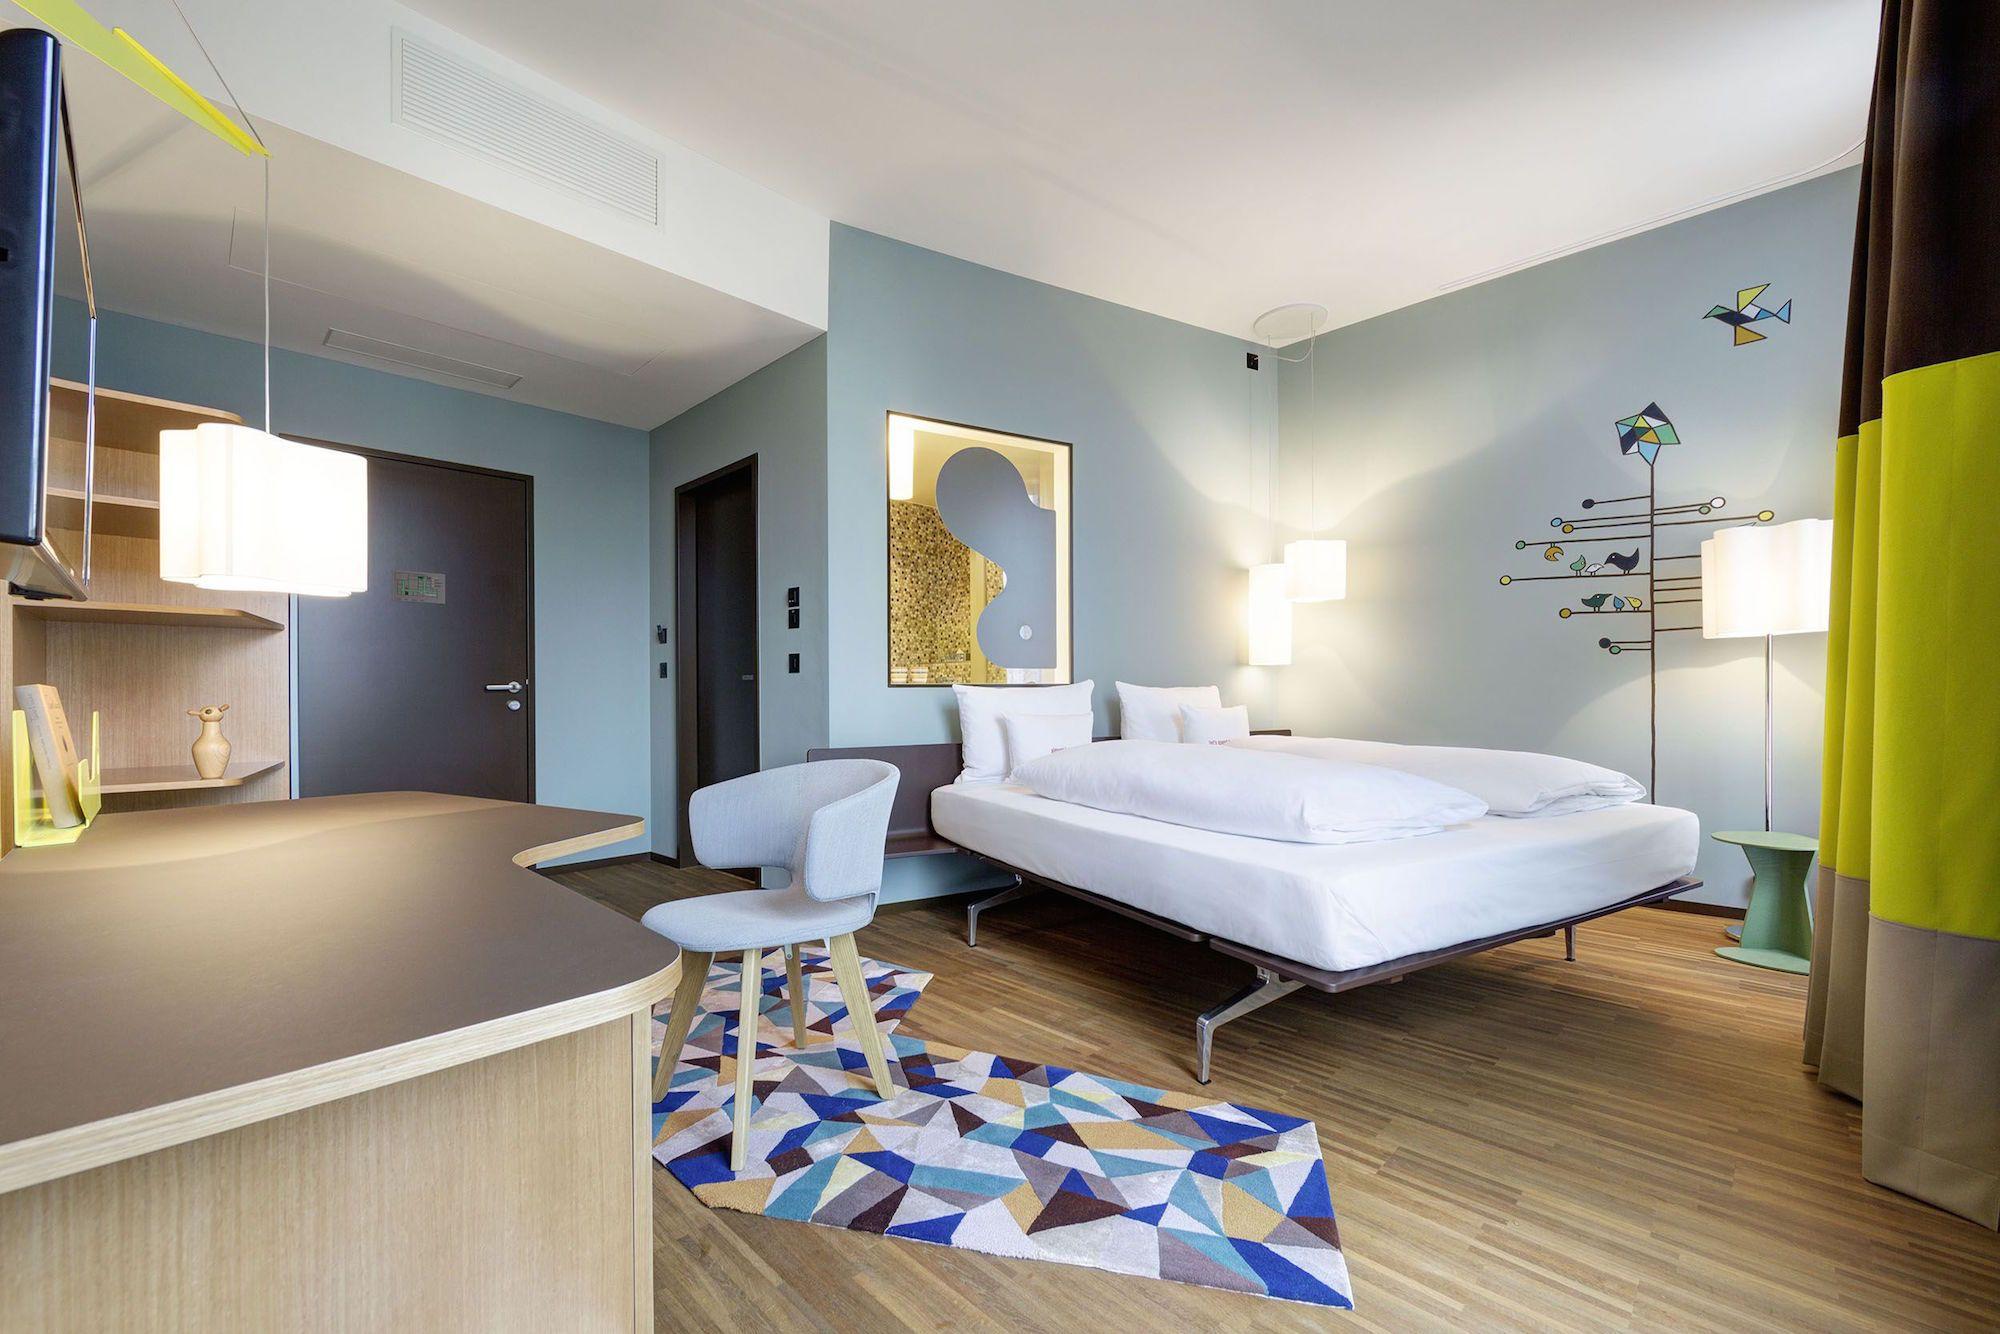 Hotel_25hours_Platinimmer_02